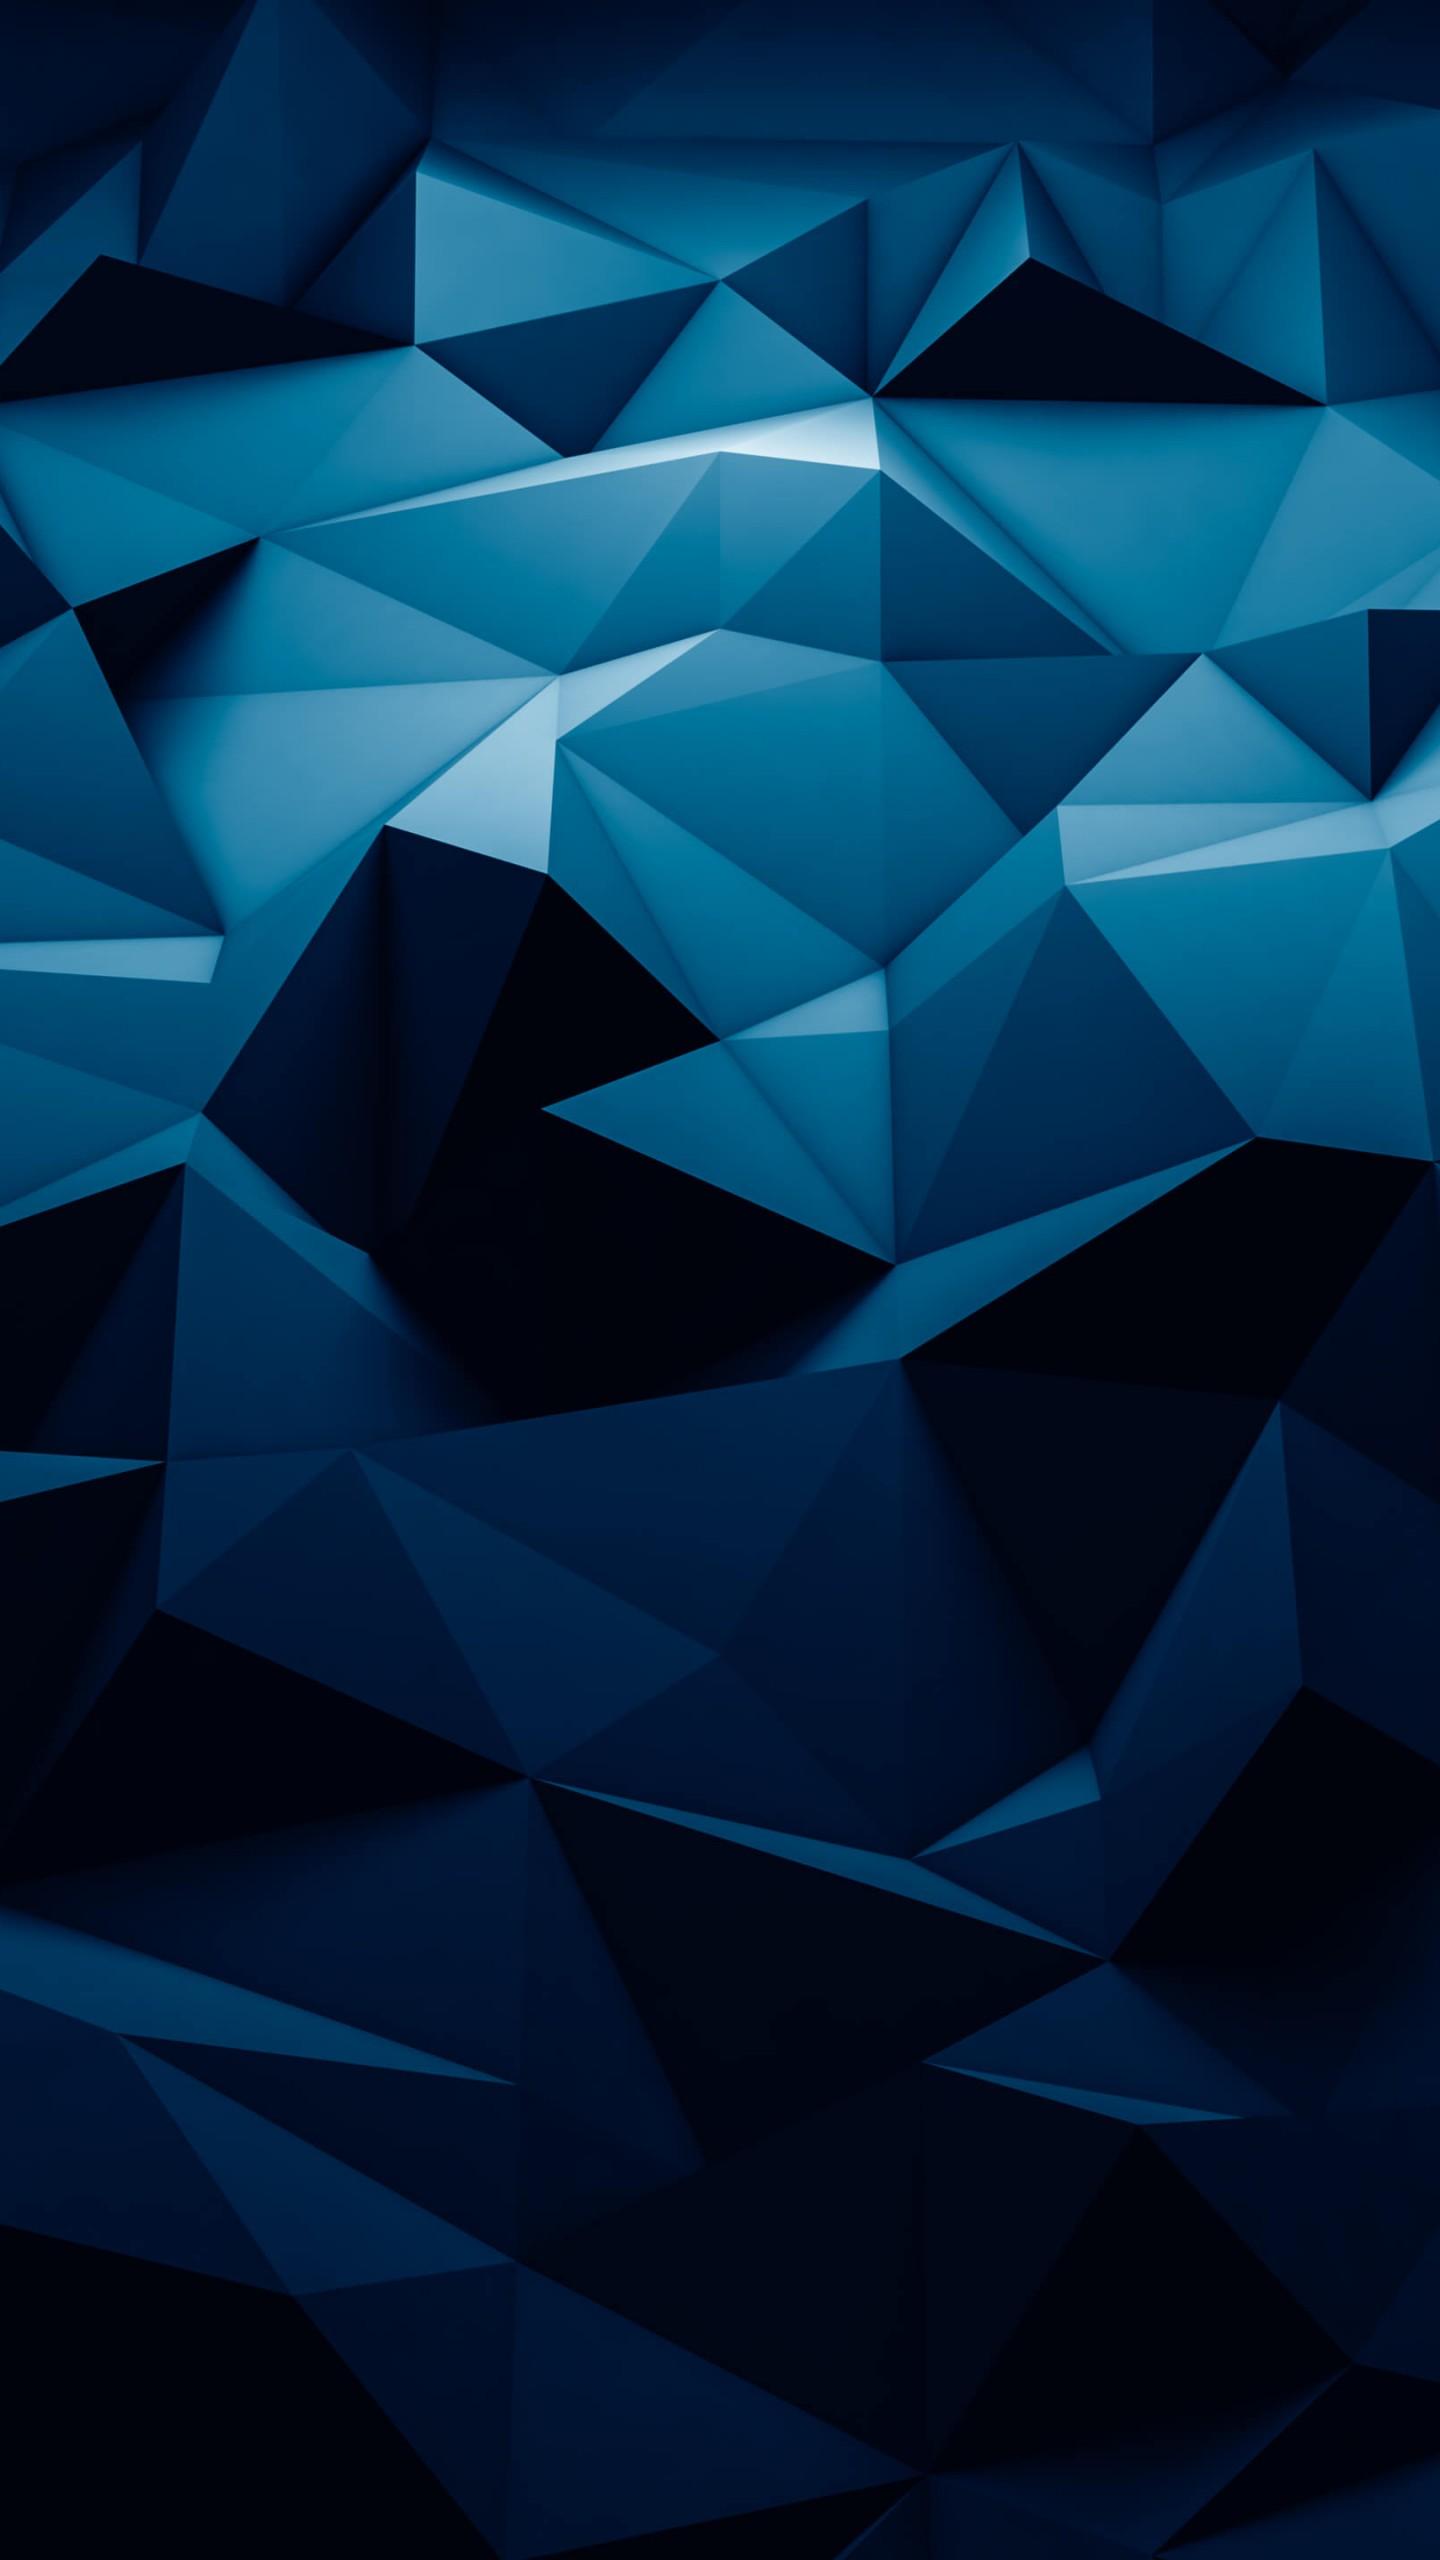 69 Nexus Wallpapers Download On Wallpapersafari